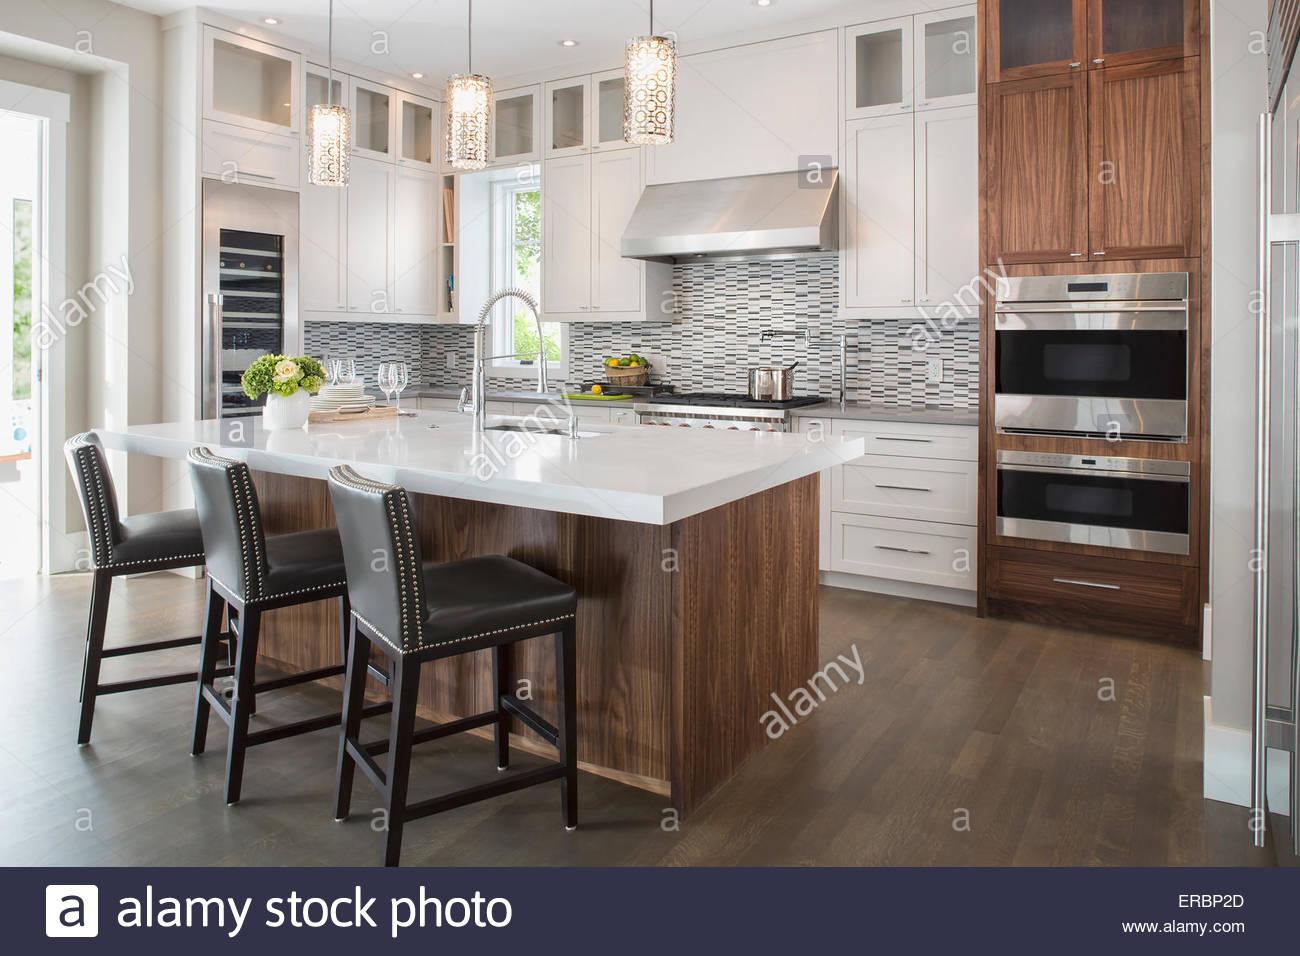 Pendant lights over modern white kitchen island - Stock Image